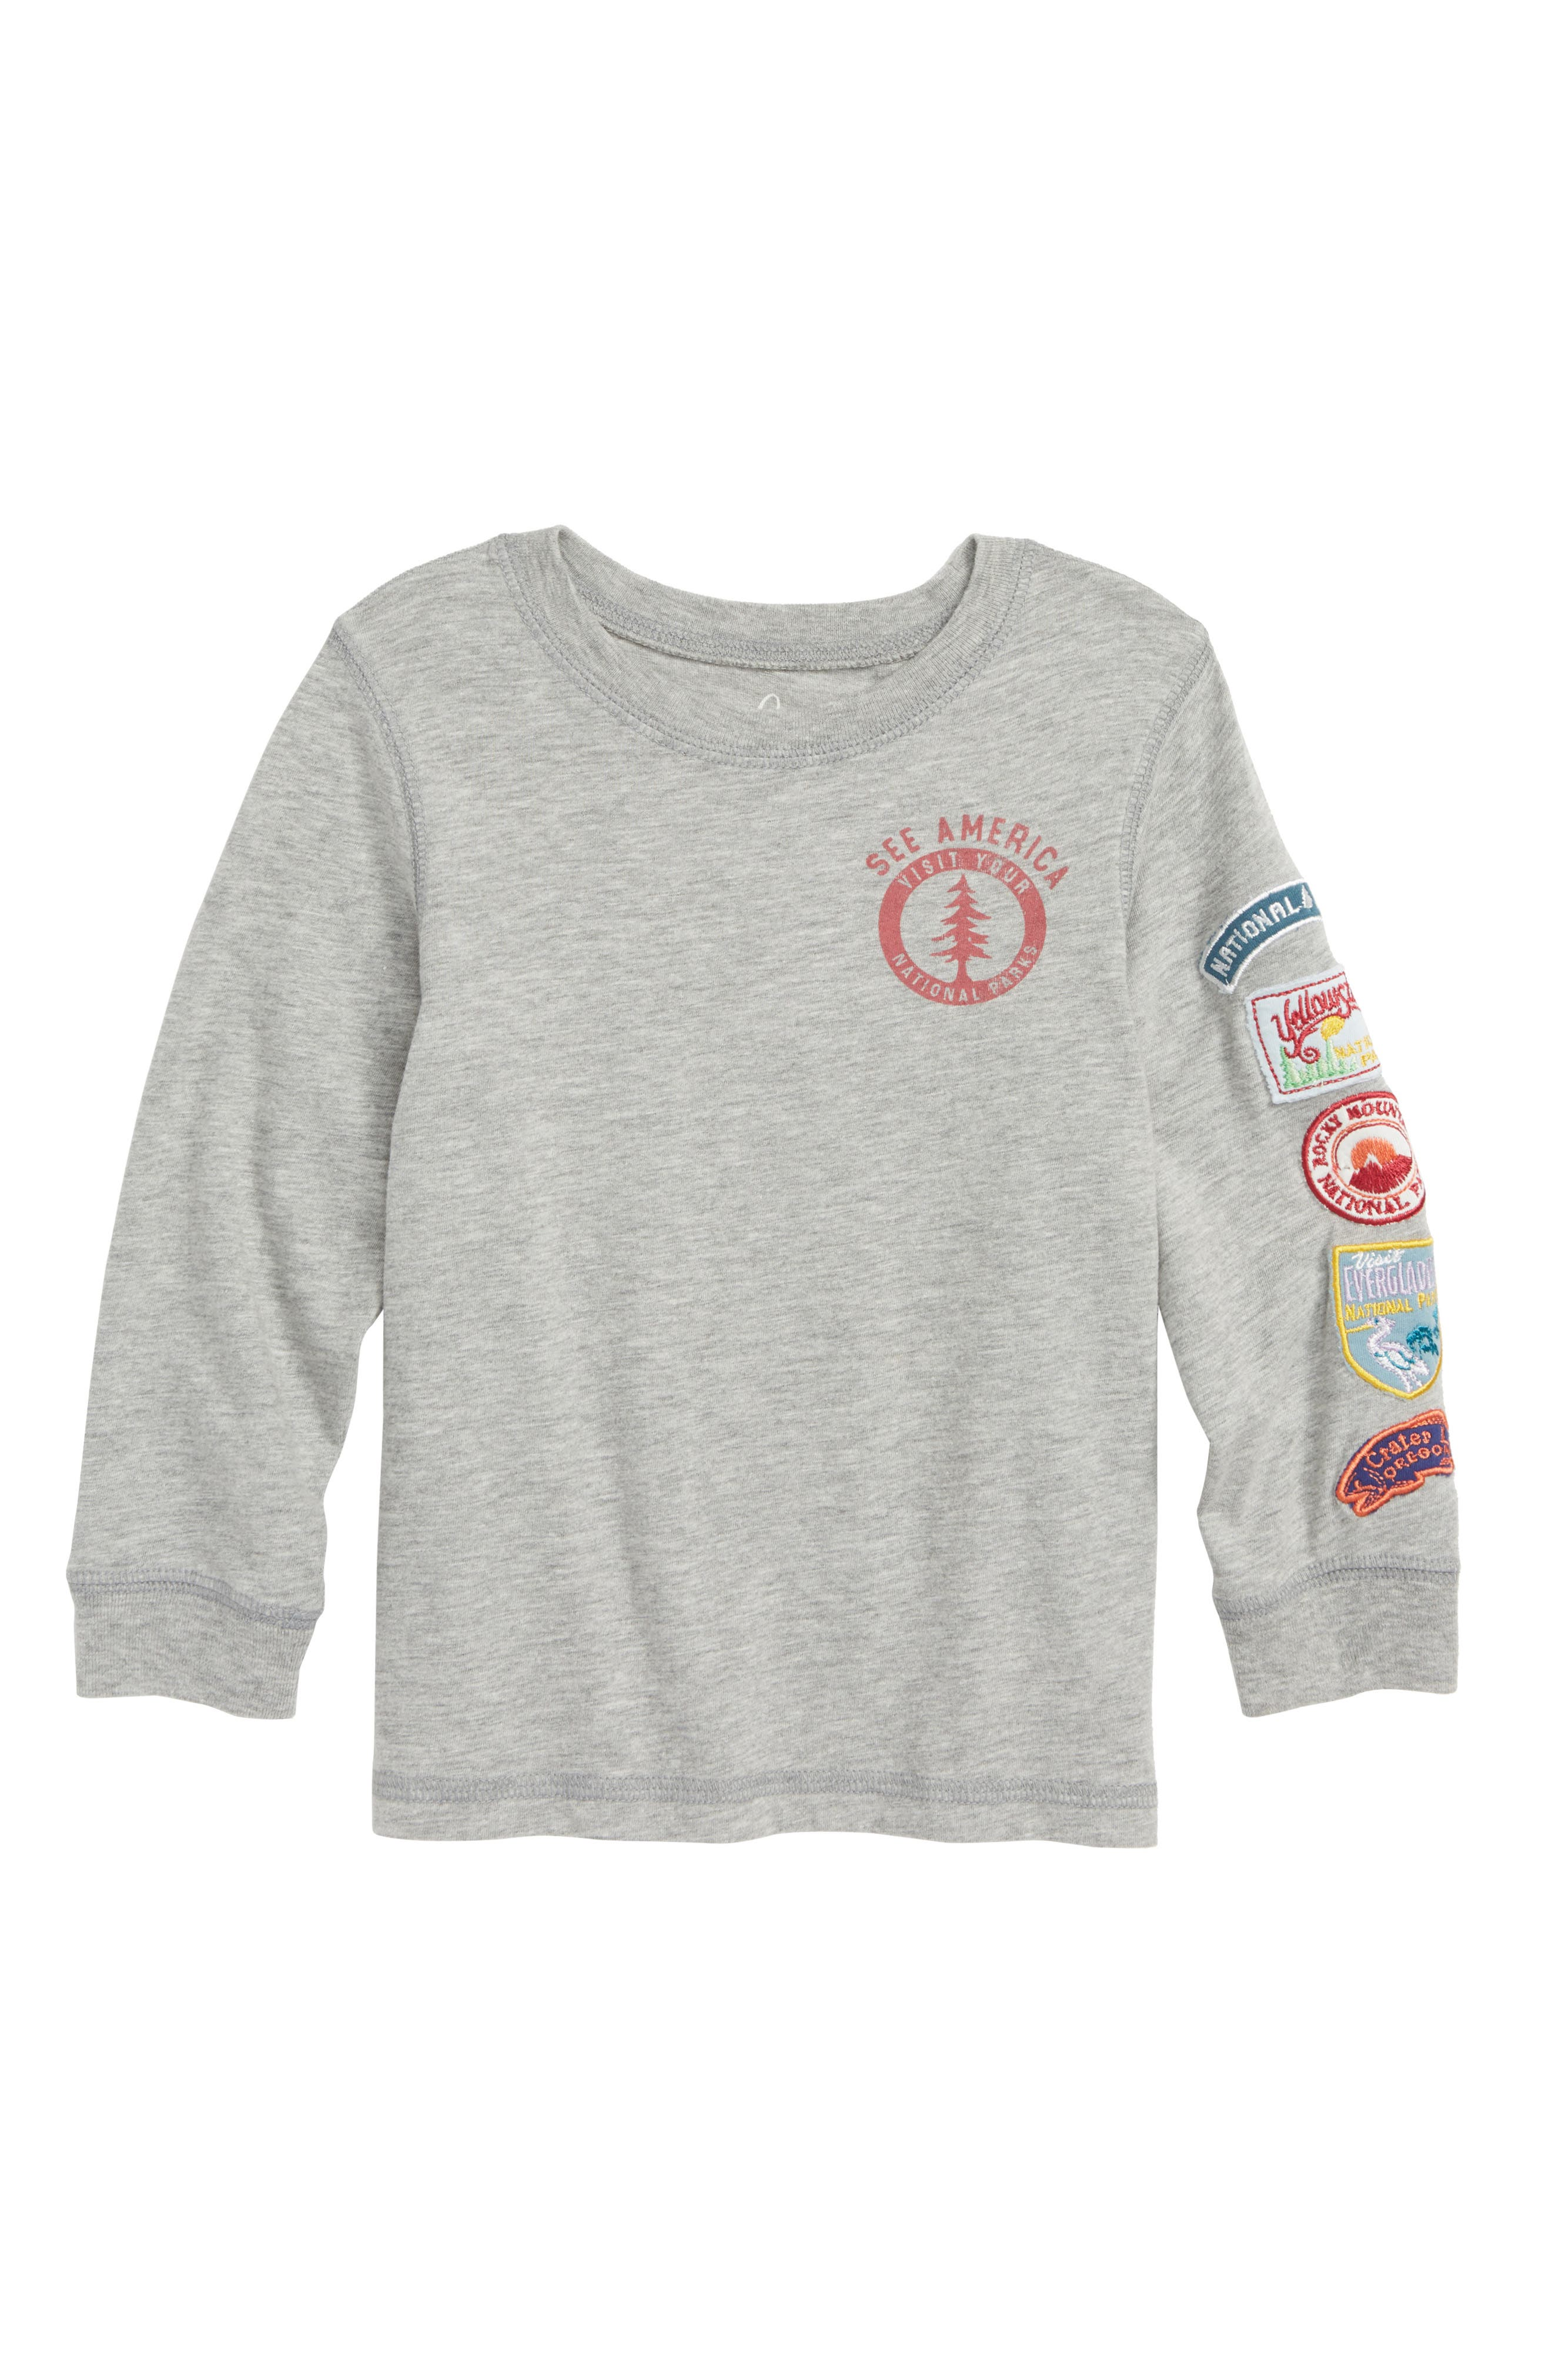 See America Graphic T-Shirt,                             Main thumbnail 1, color,                             LIGHT GREY